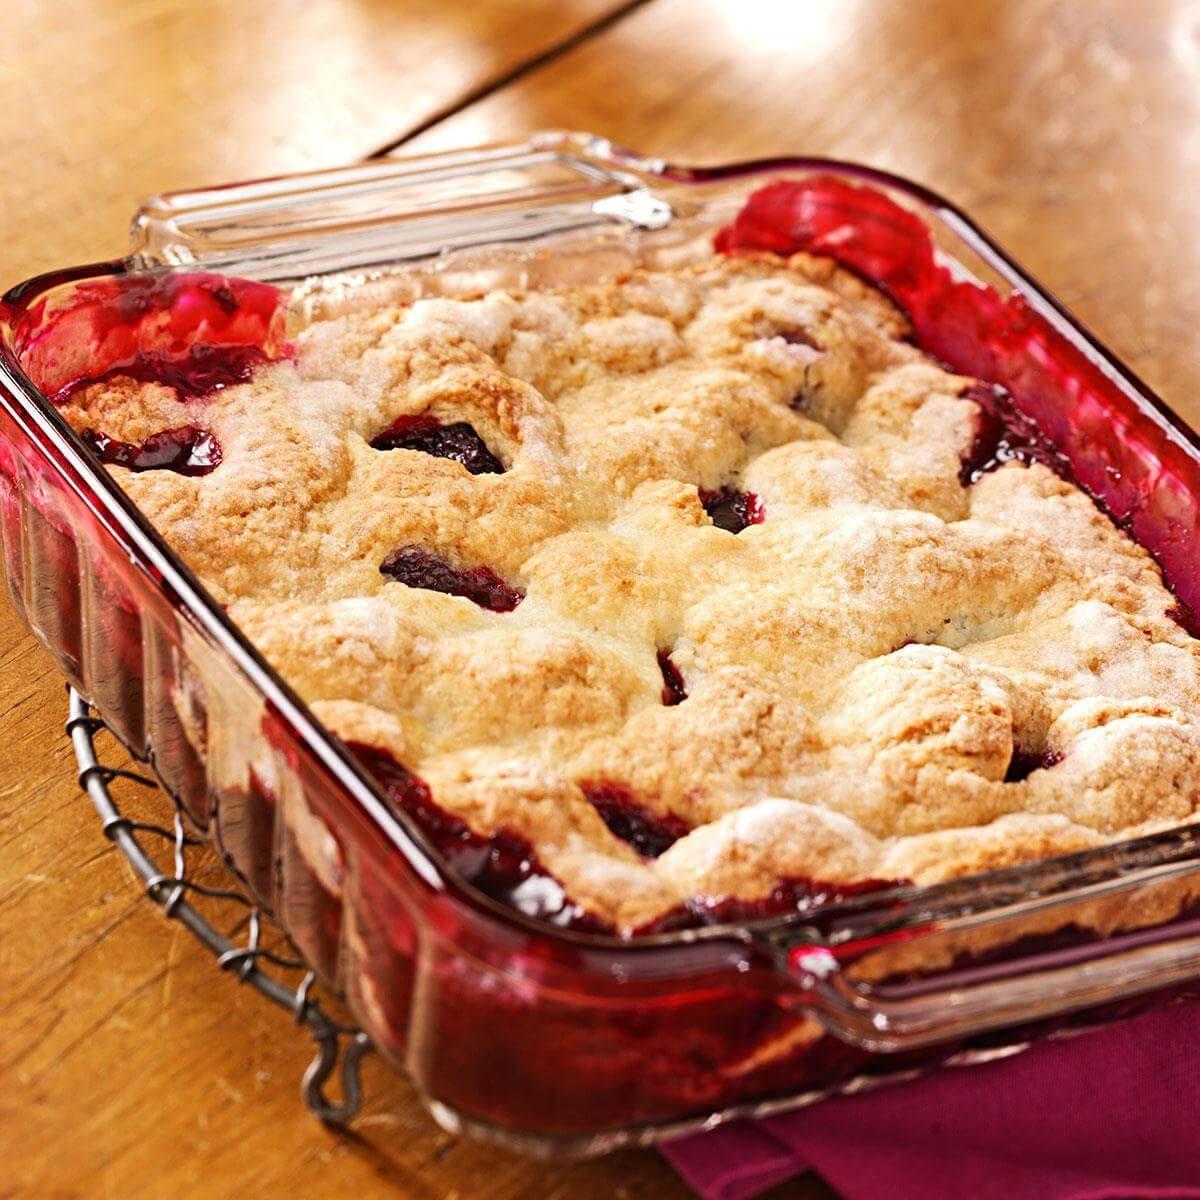 Blackberry Dessert Recipes: Best Blackberry Cobbler Recipe